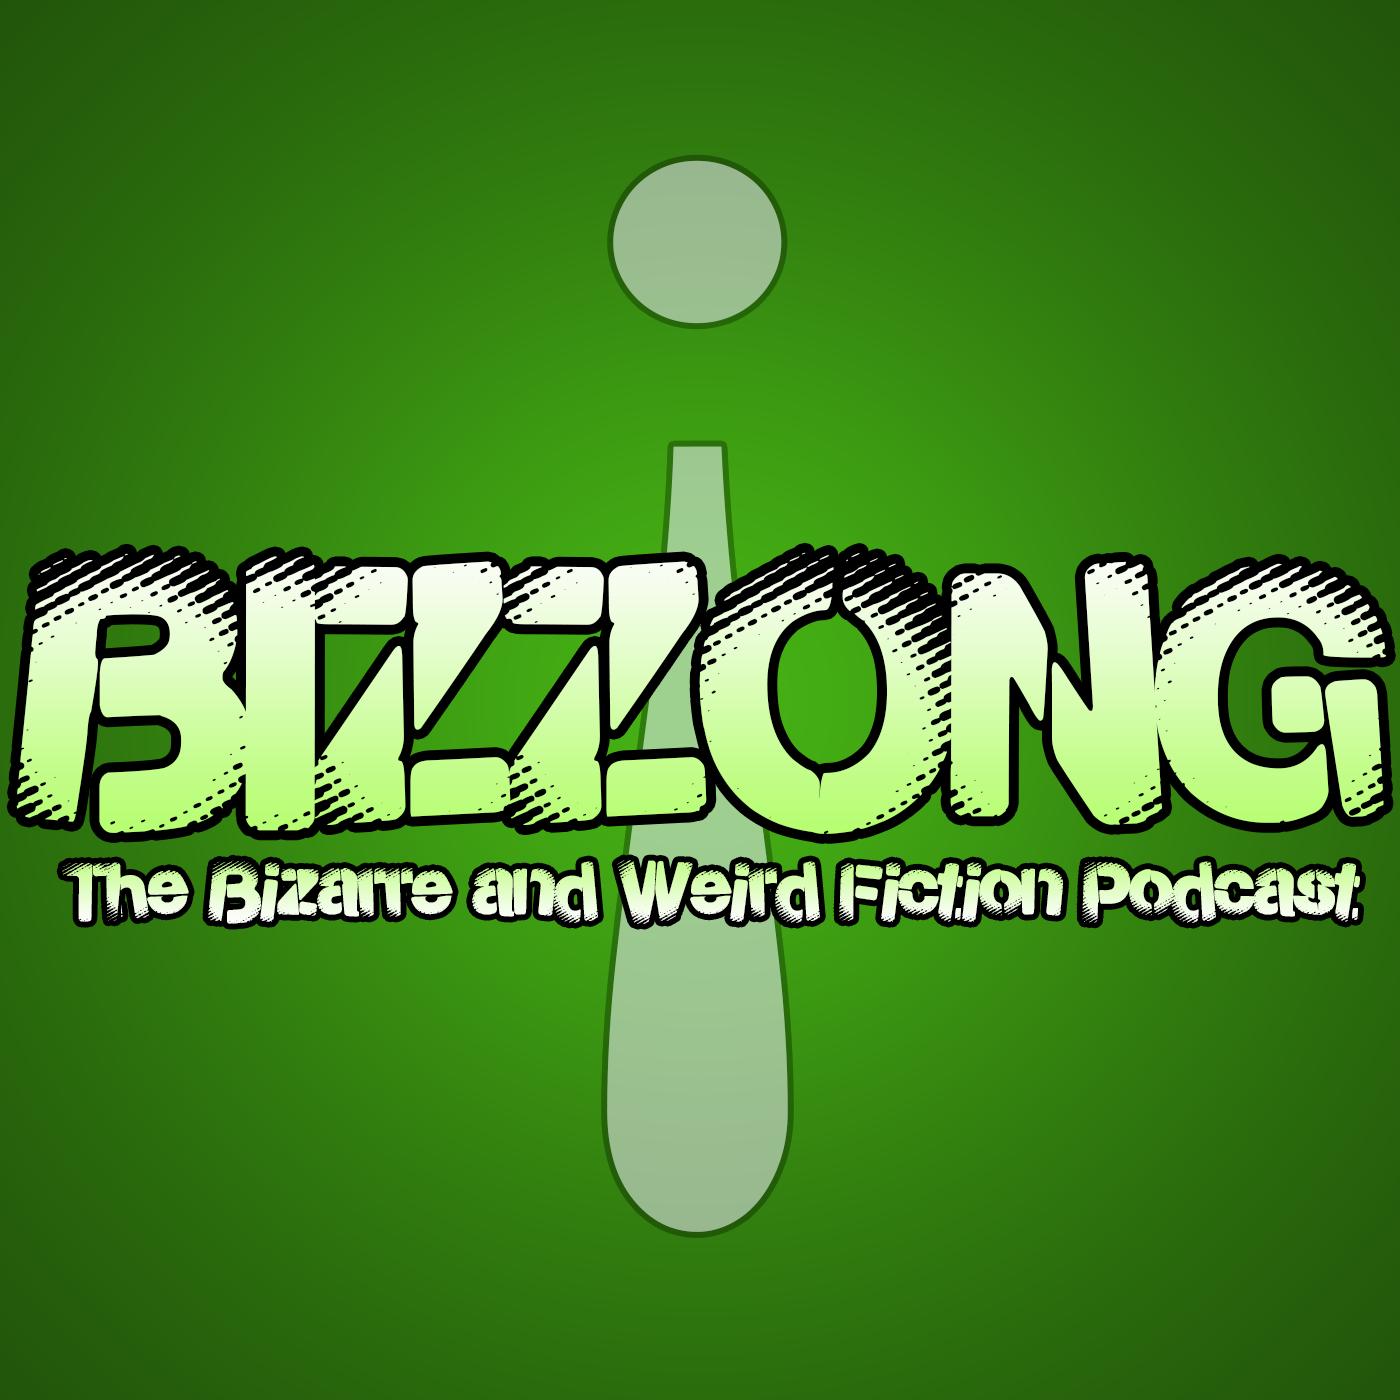 Artwork for New England Weirdo : Jeff O'Brien : Bizzong! The Bizarre and Weird Fiction Podcast